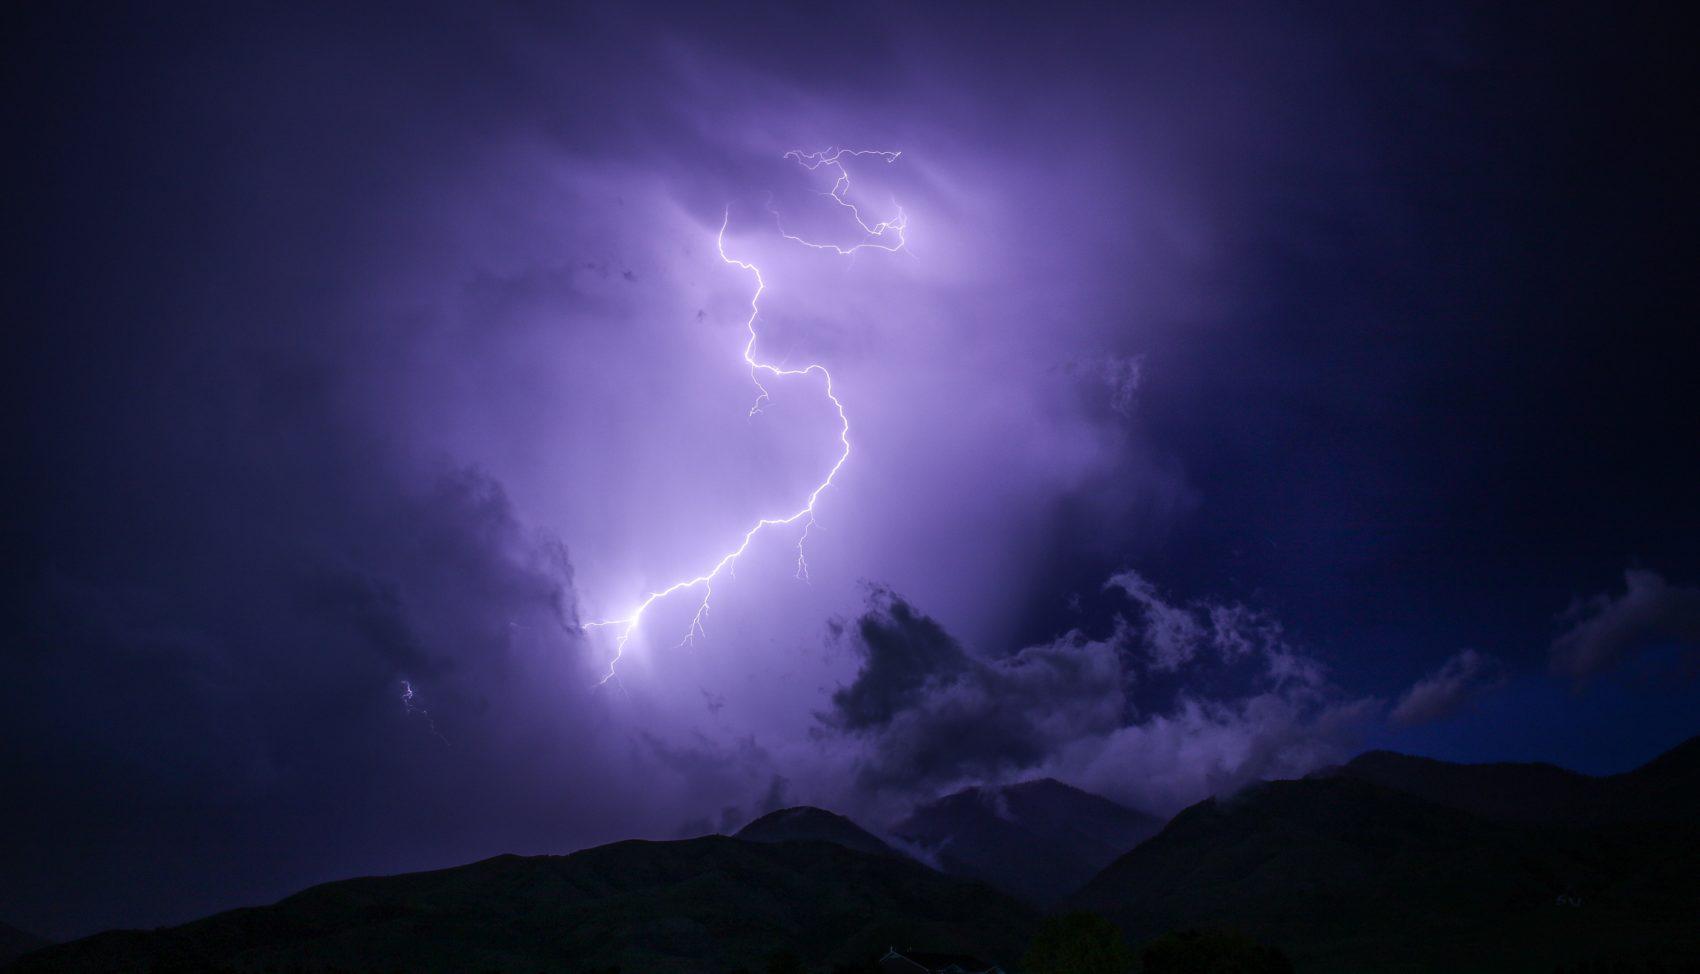 lightning, boulder, flagstaff mountain, lightning strike, colorado